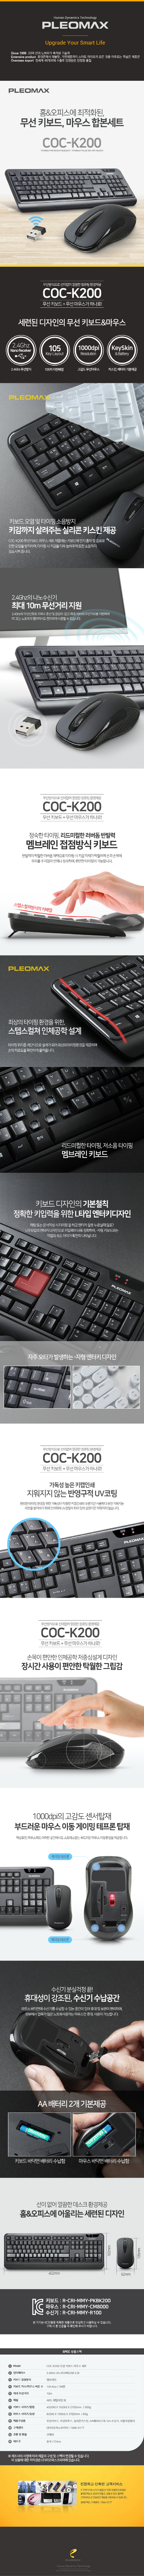 1COC-K200.jpg